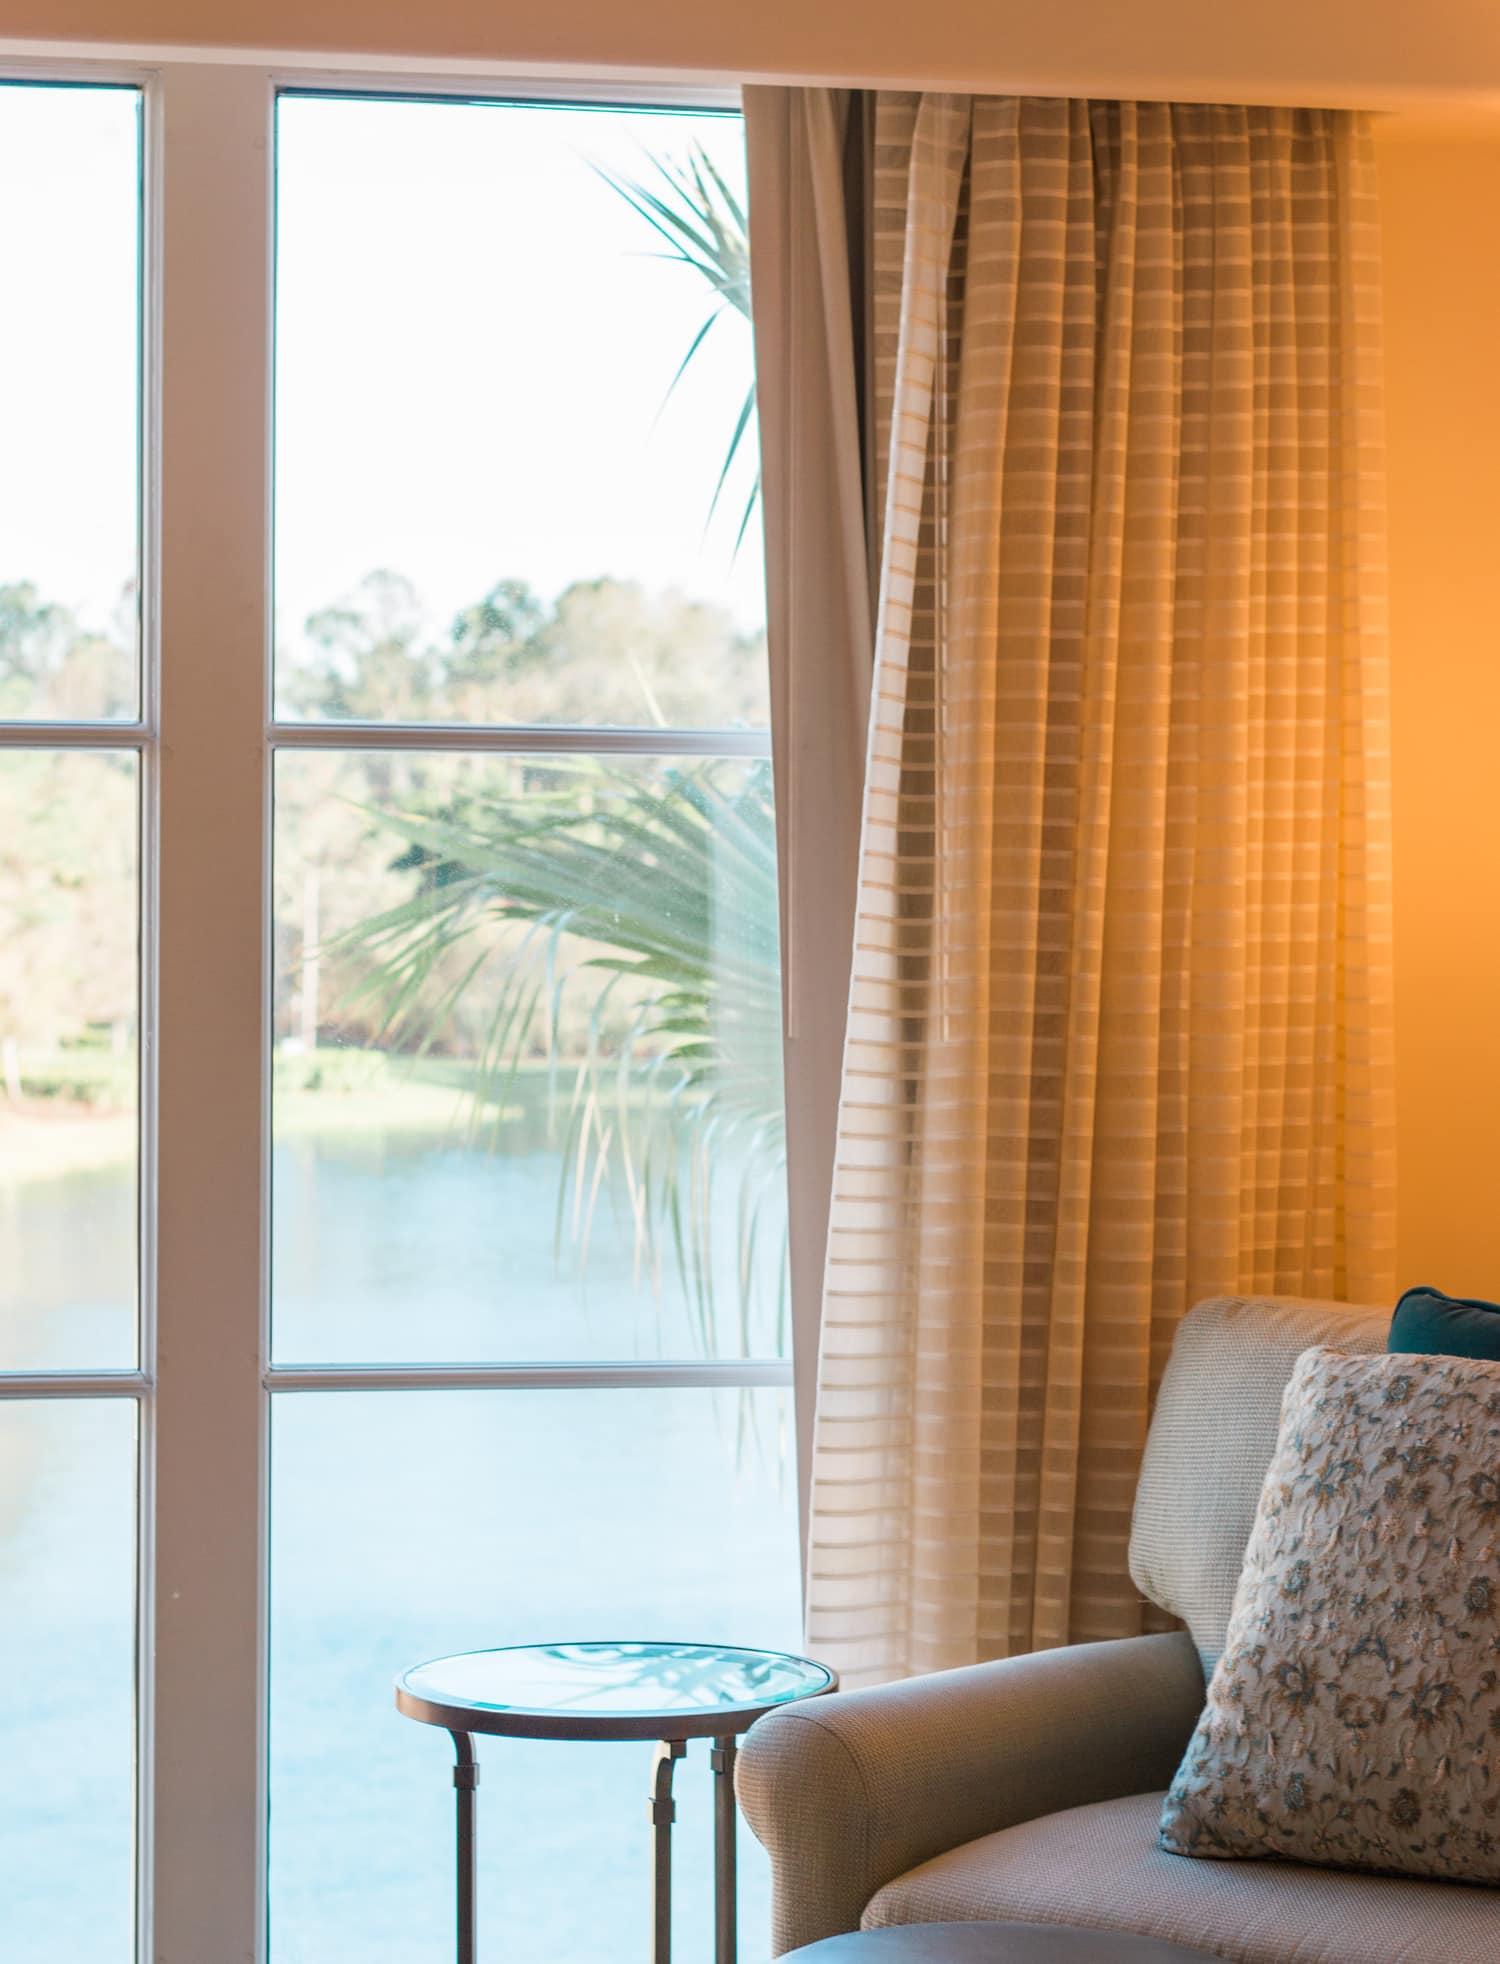 Loews Portofino Bay hotel room view Orlando vacation